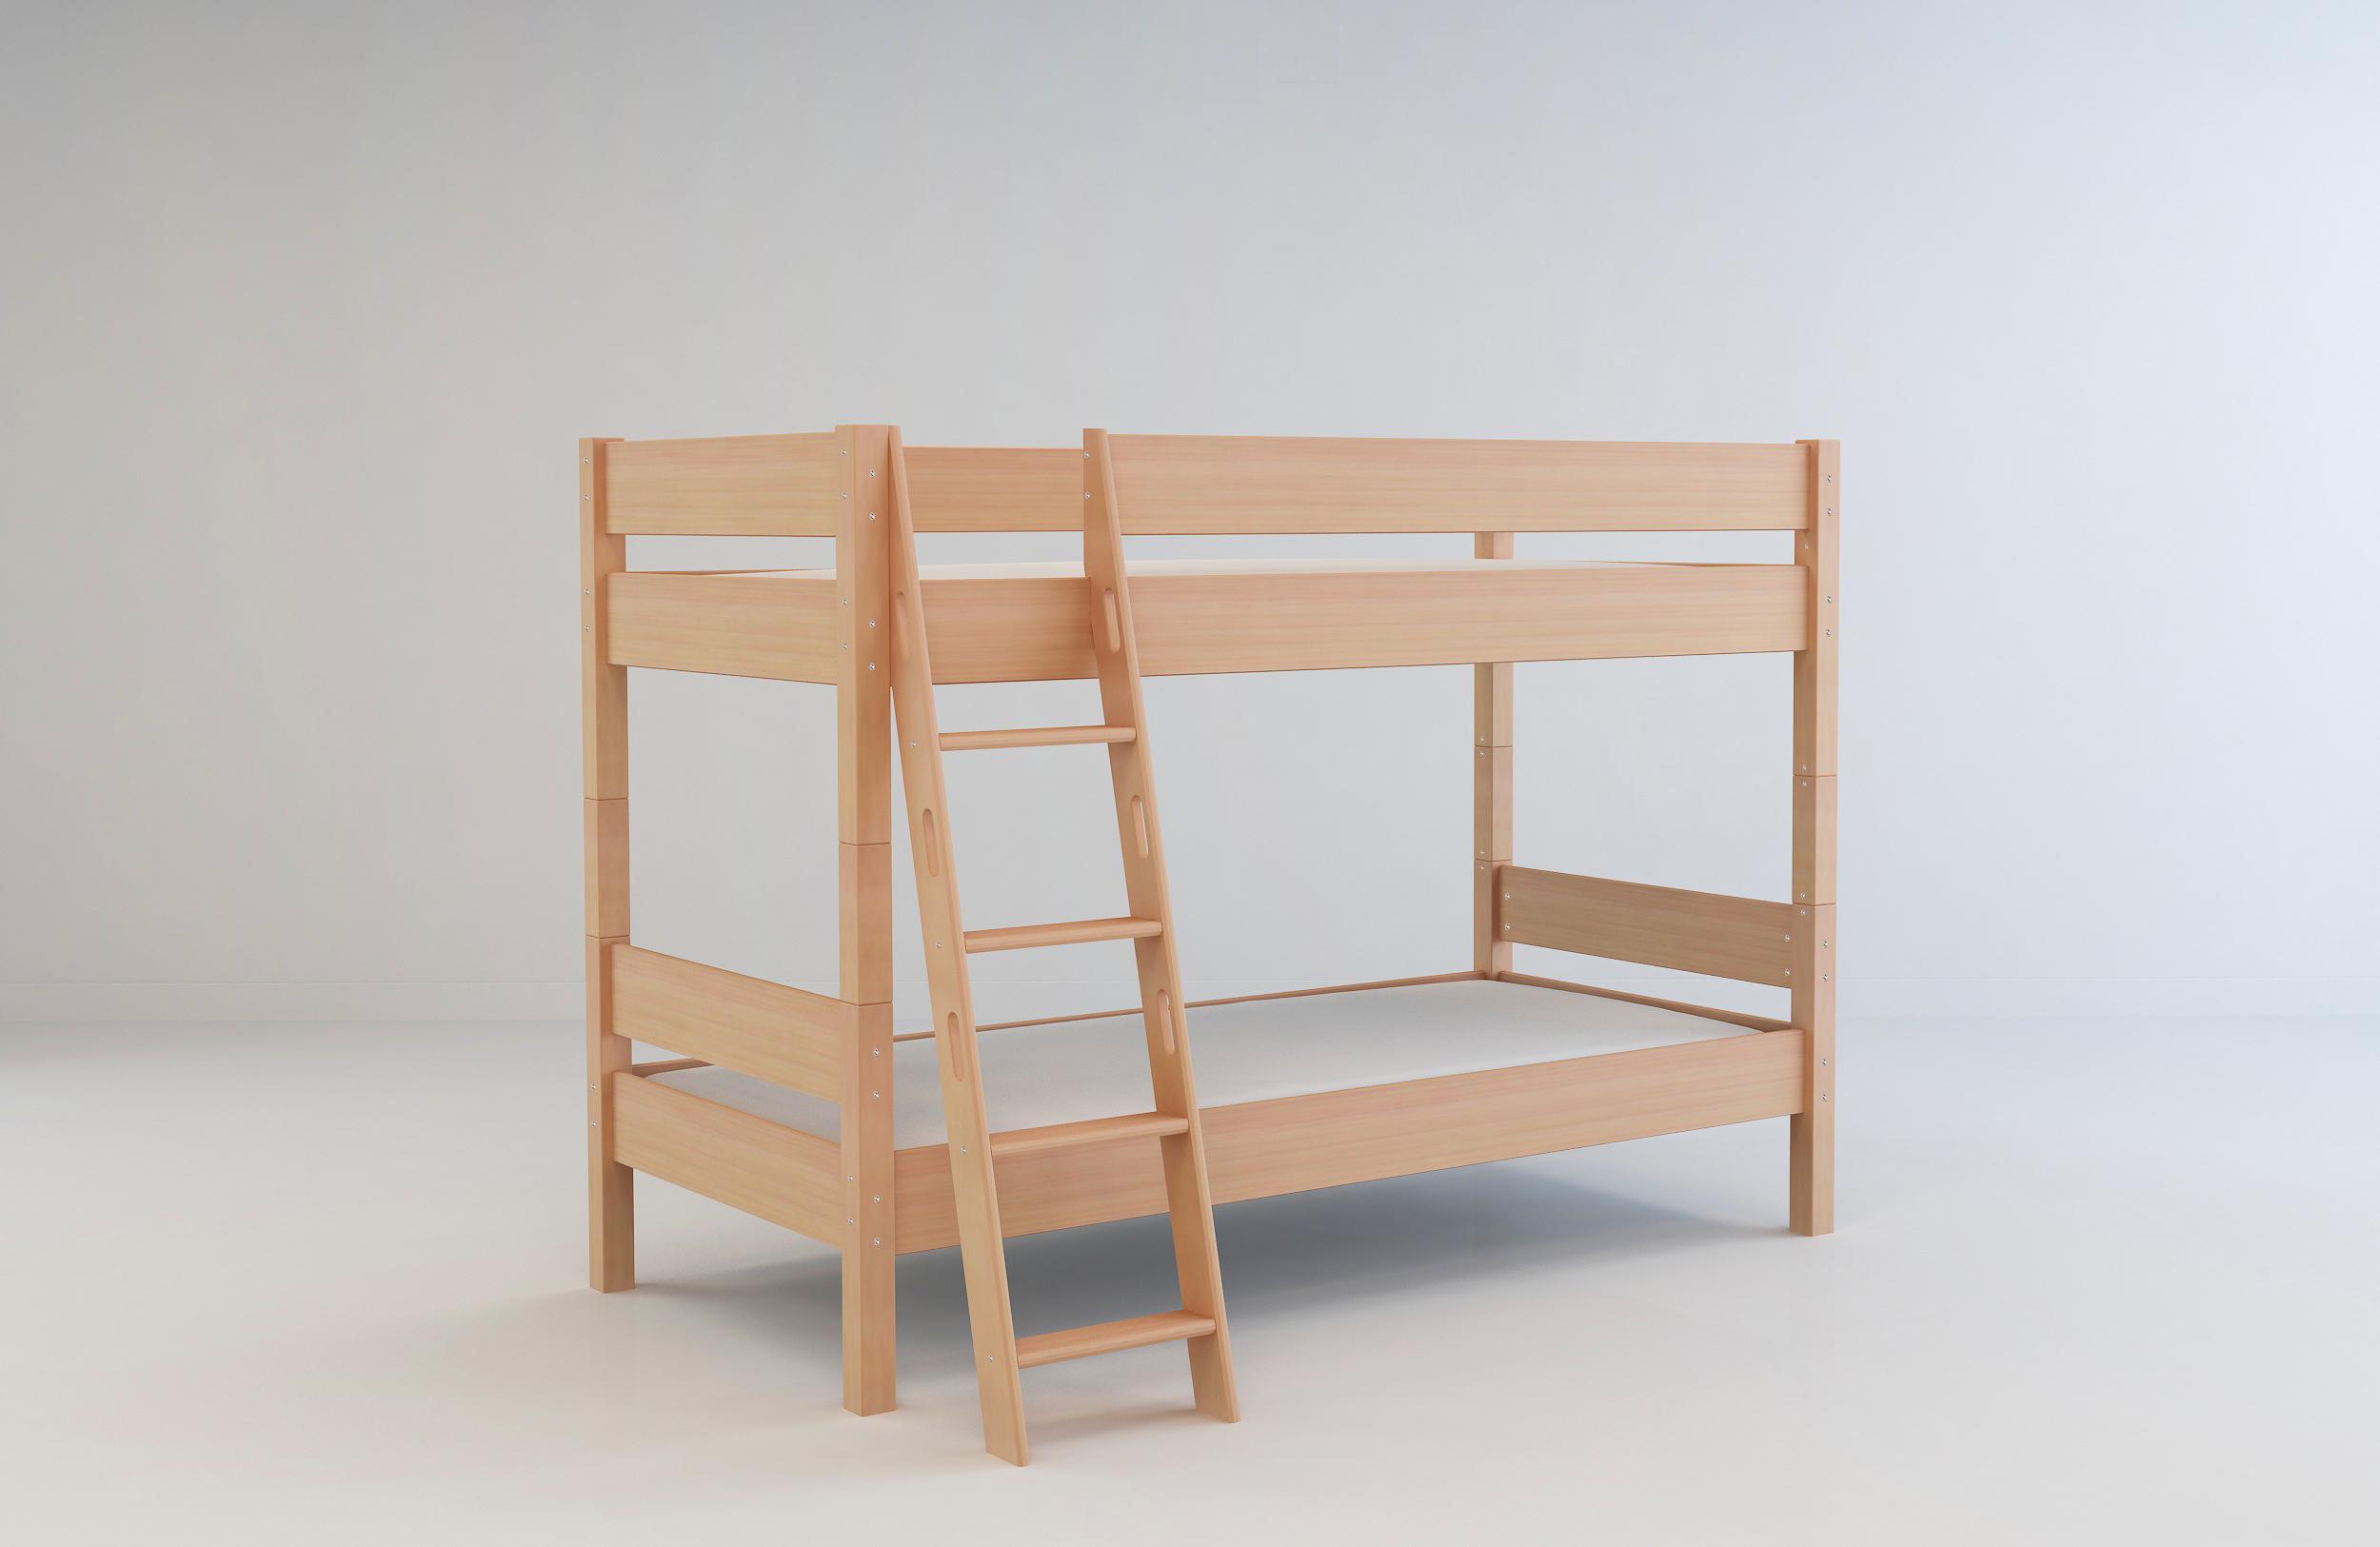 Full Size of Kinderzimmer Hochbett Sofa Regal Weiß Regale Kinderzimmer Kinderzimmer Hochbett